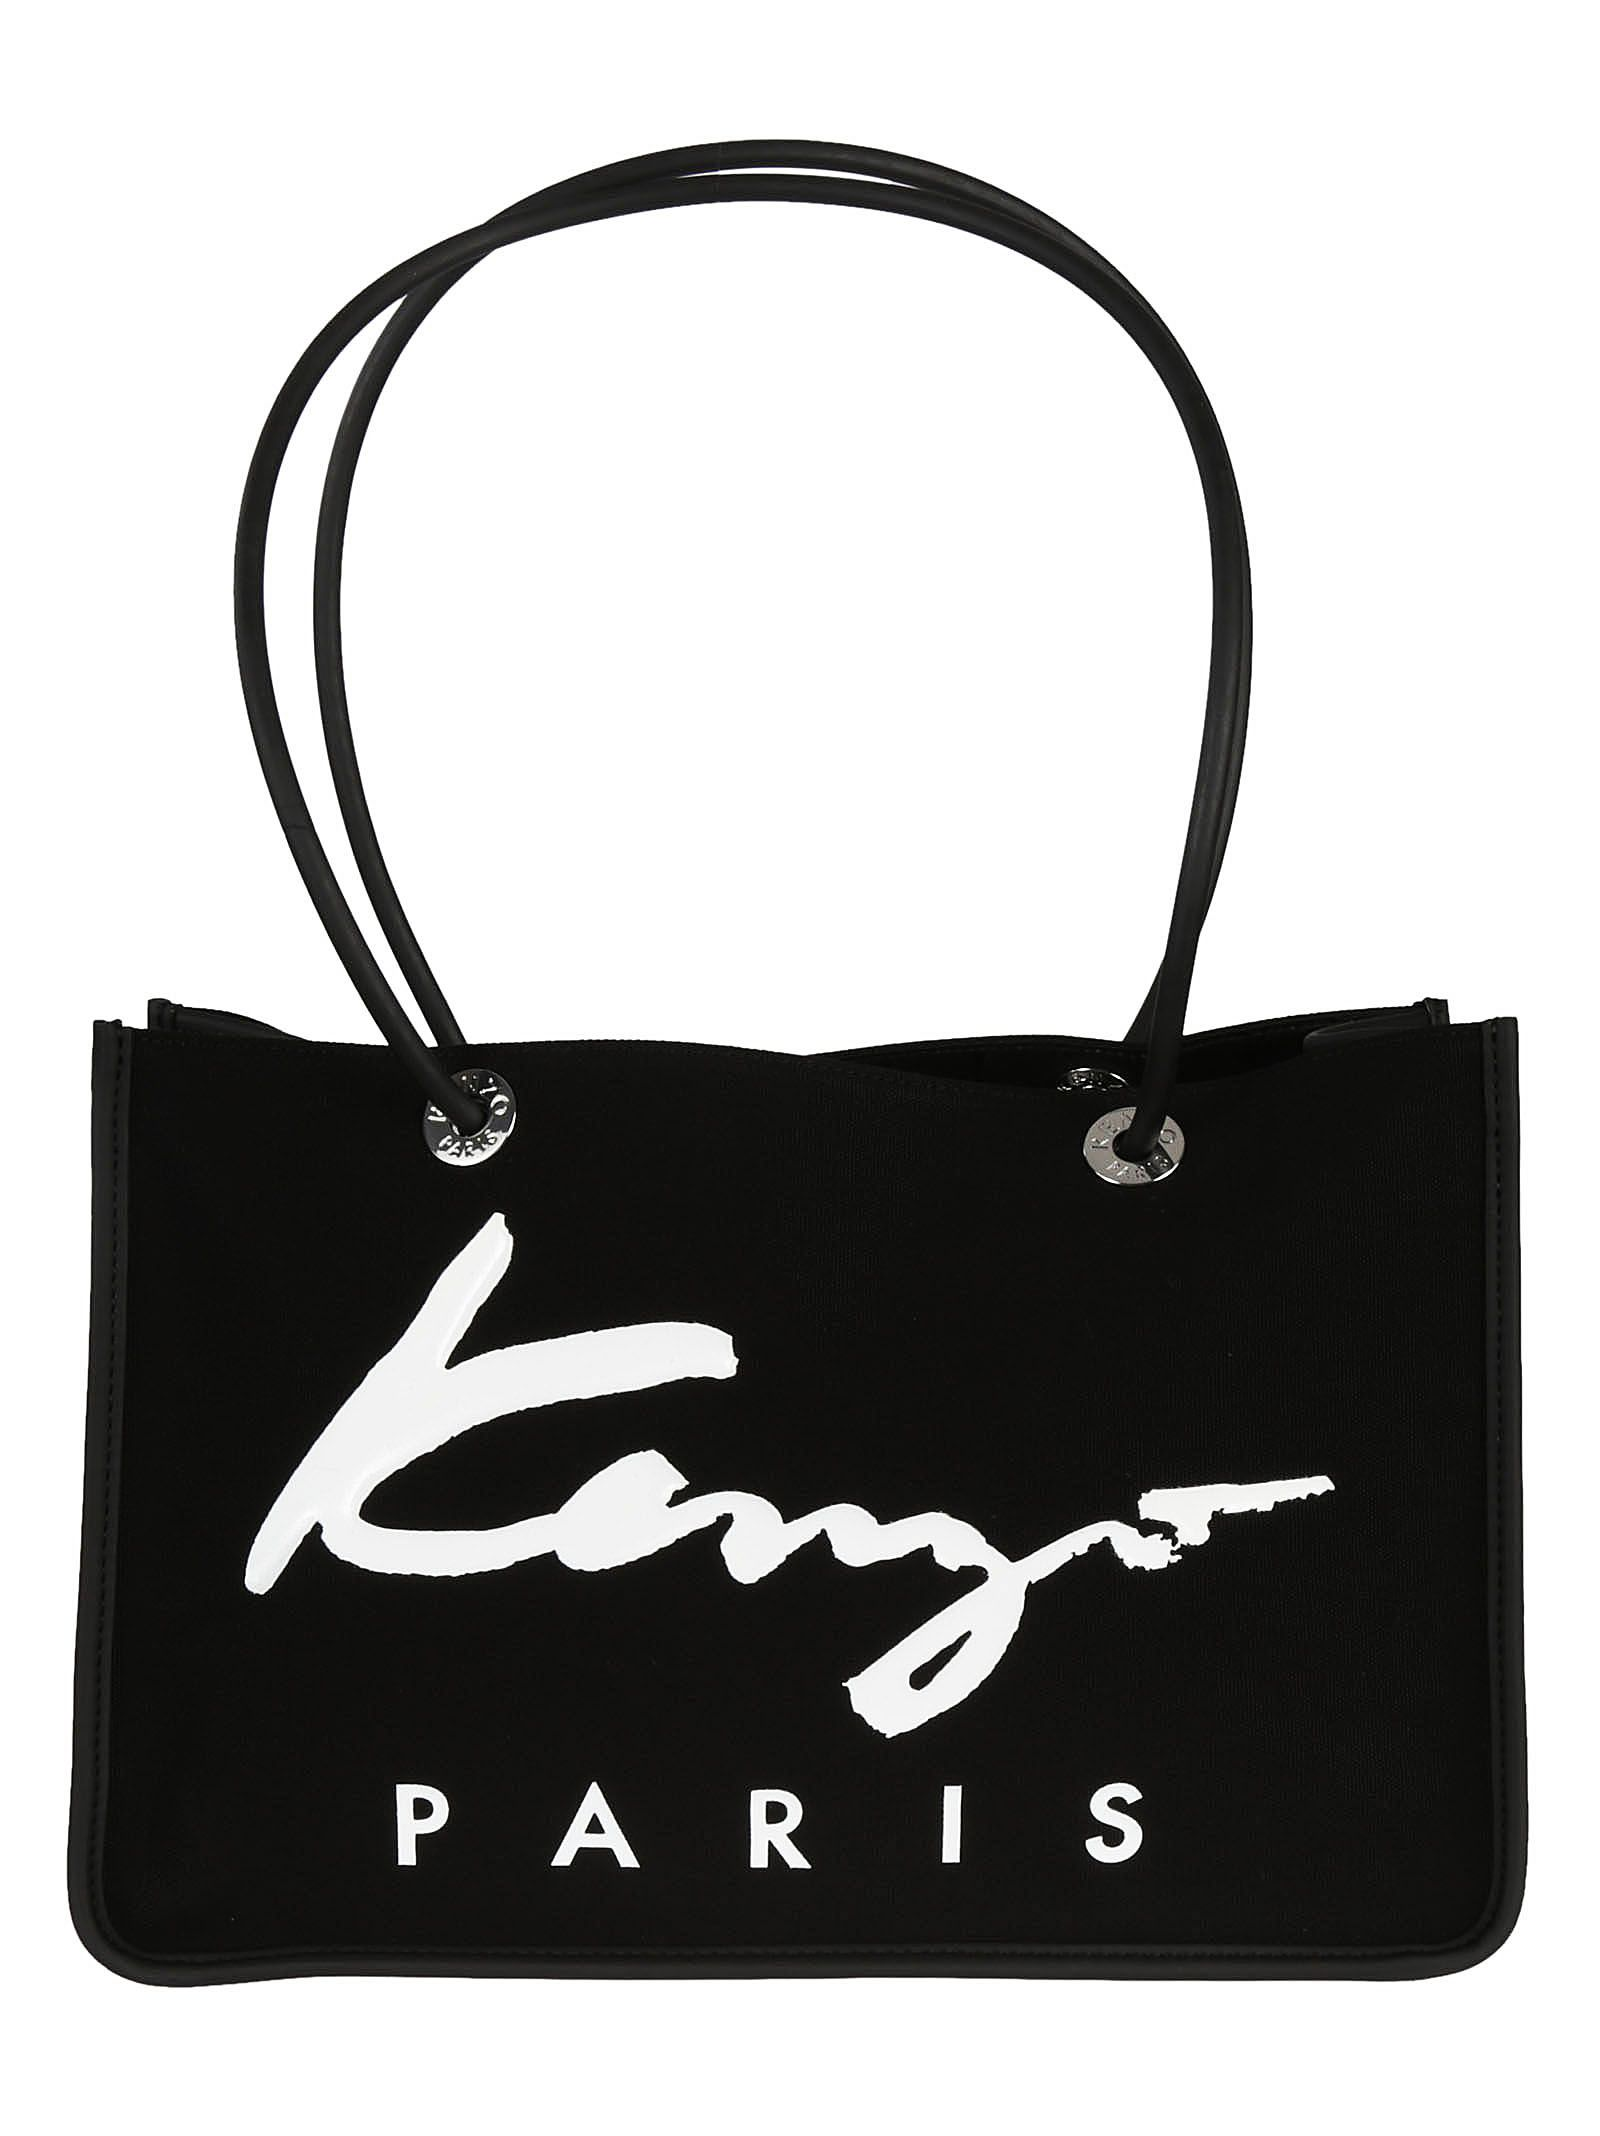 Kenzo Paris Tote